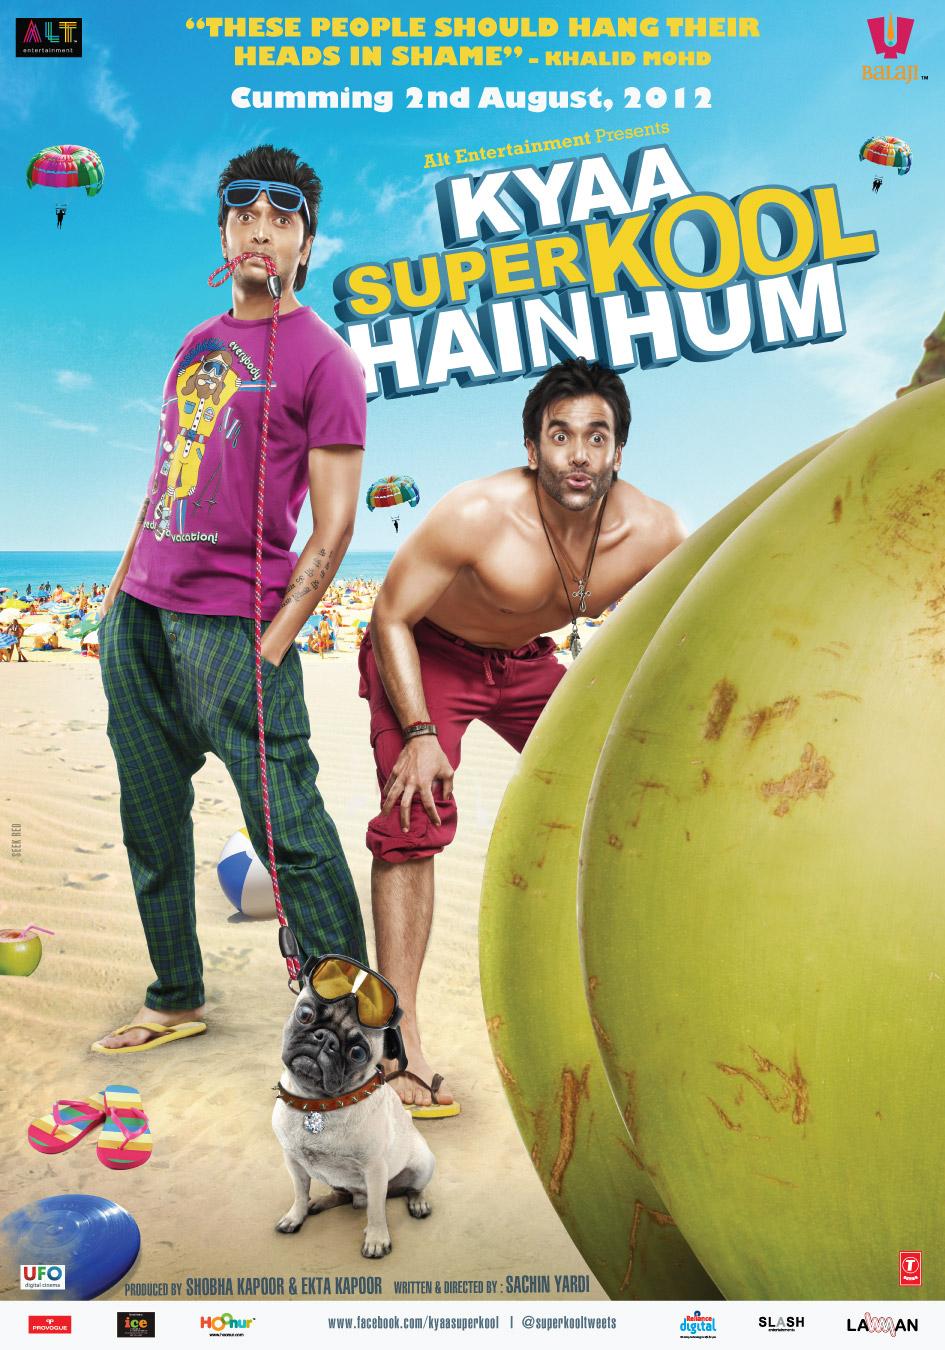 Kyaa Super Kool Hain Hum - Movie Poster #1 (Original)